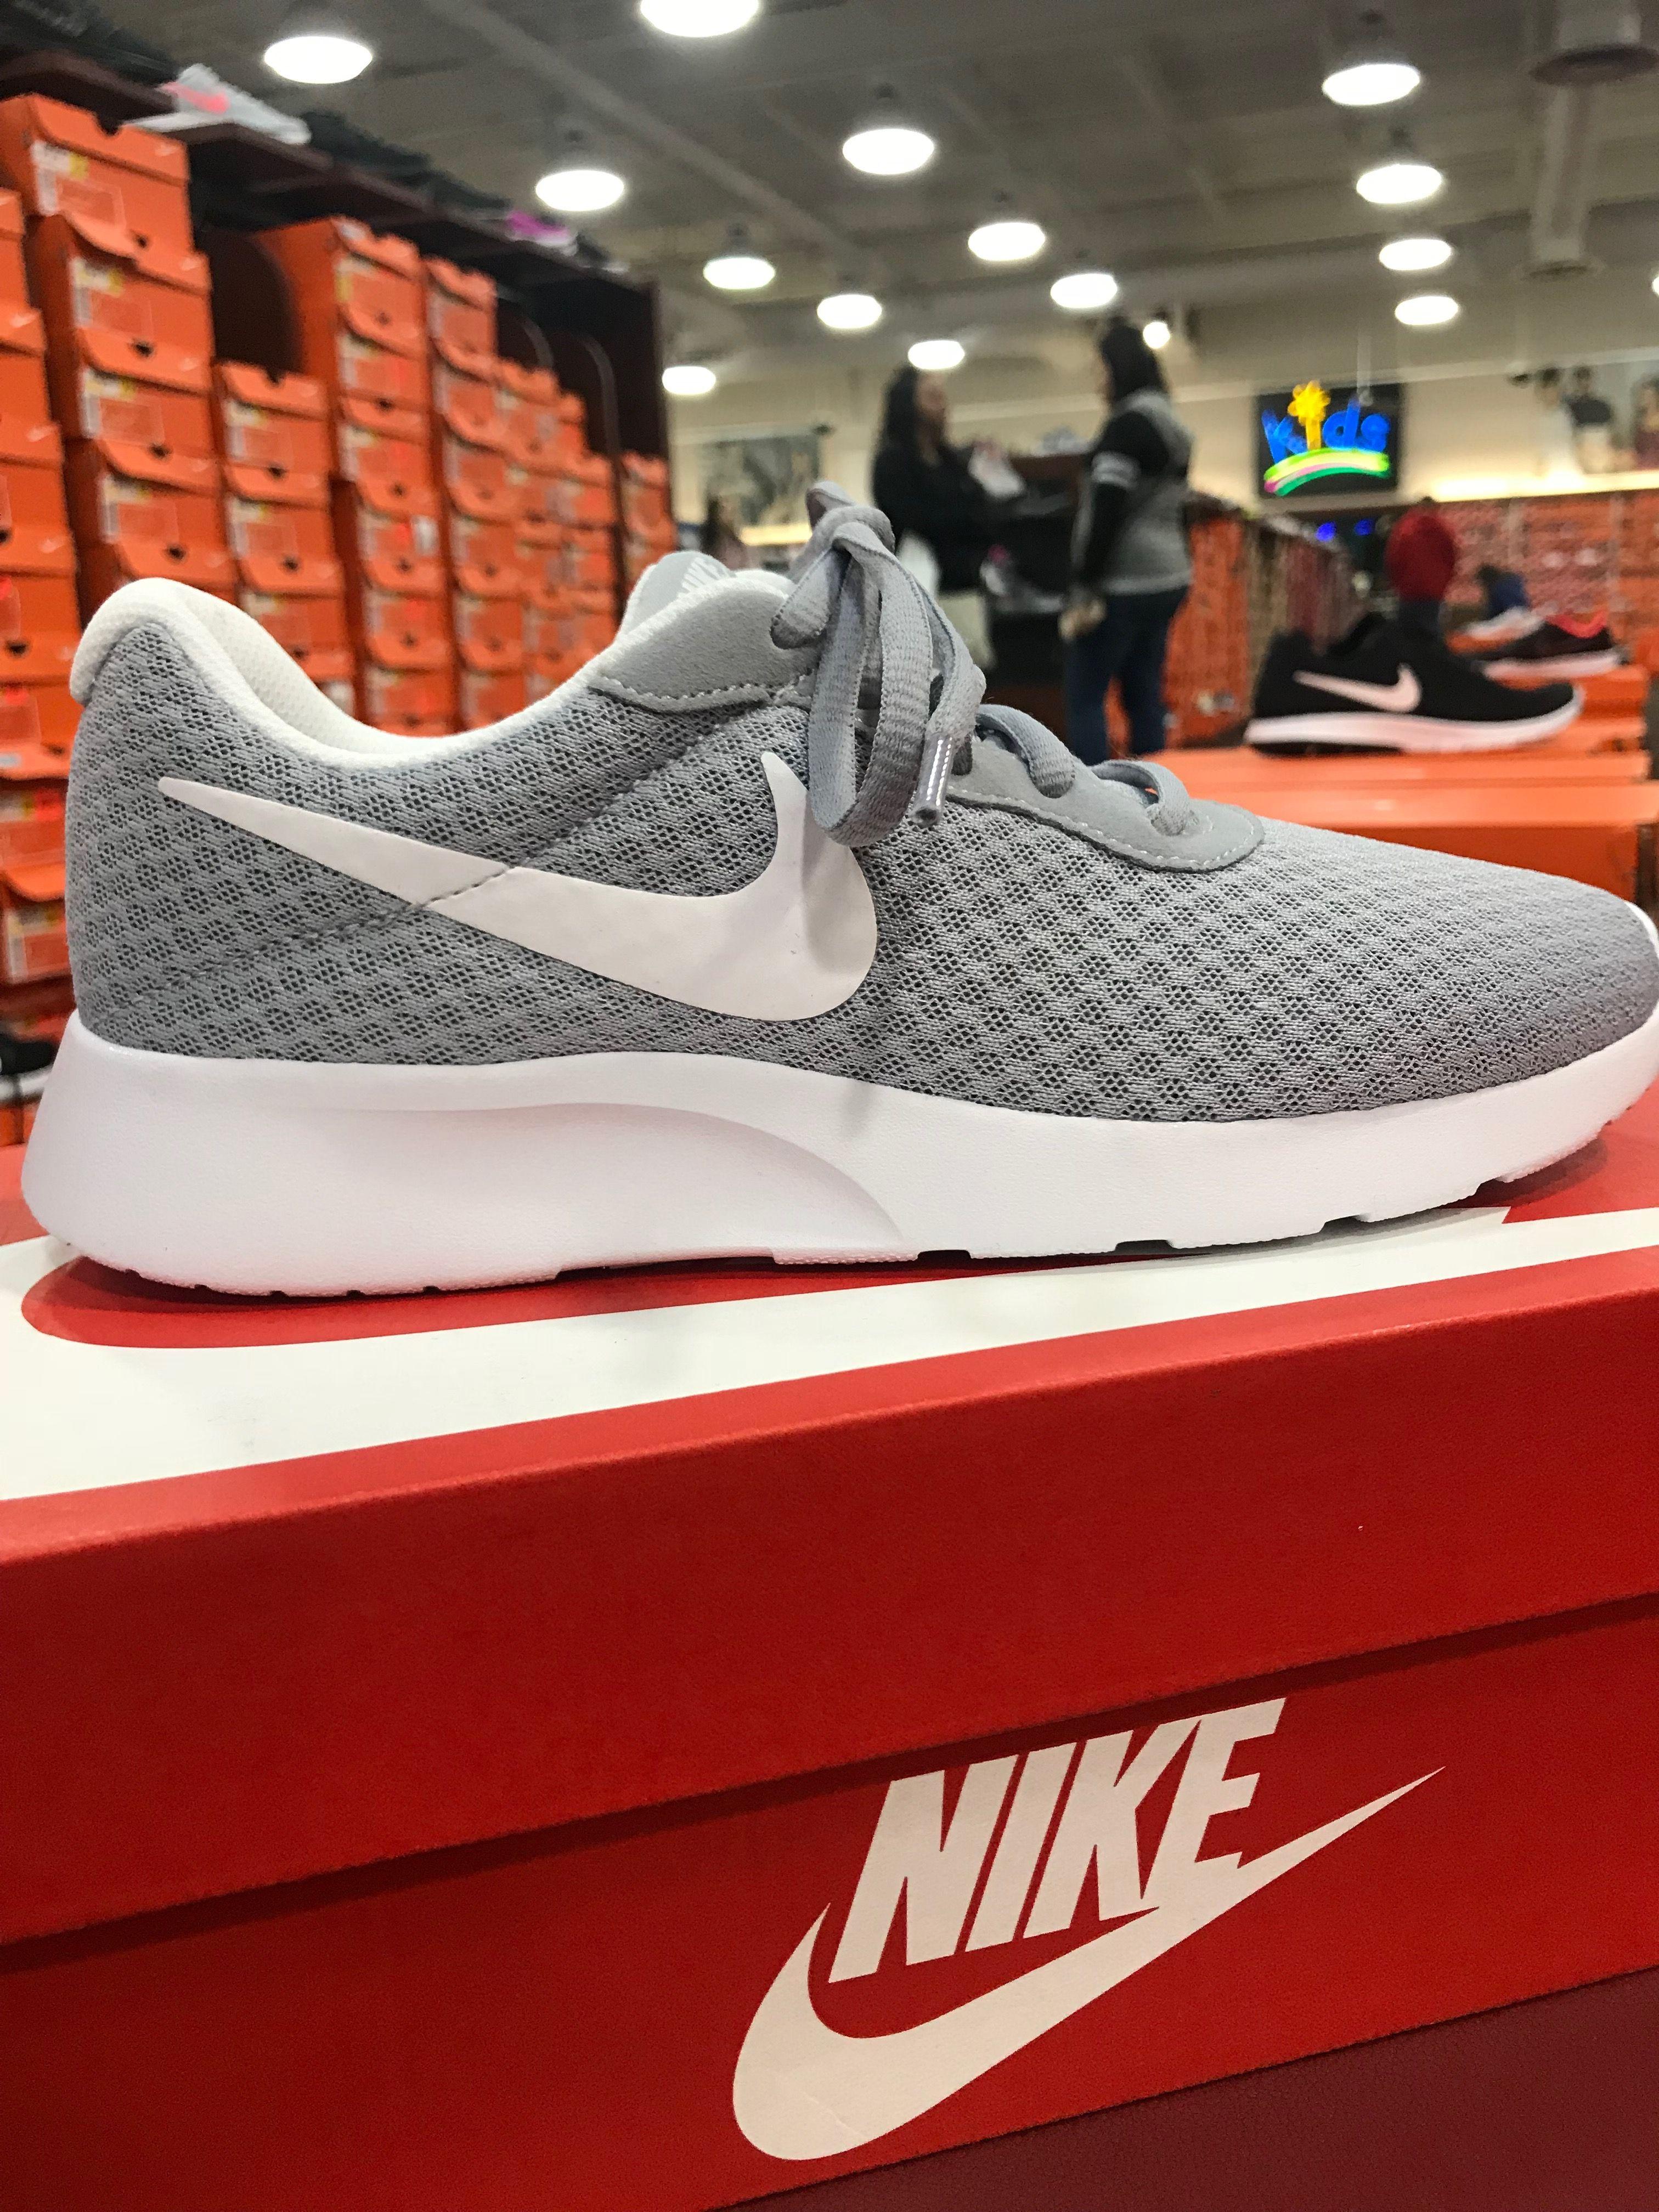 Shoe department, Shoes, Sneakers nike